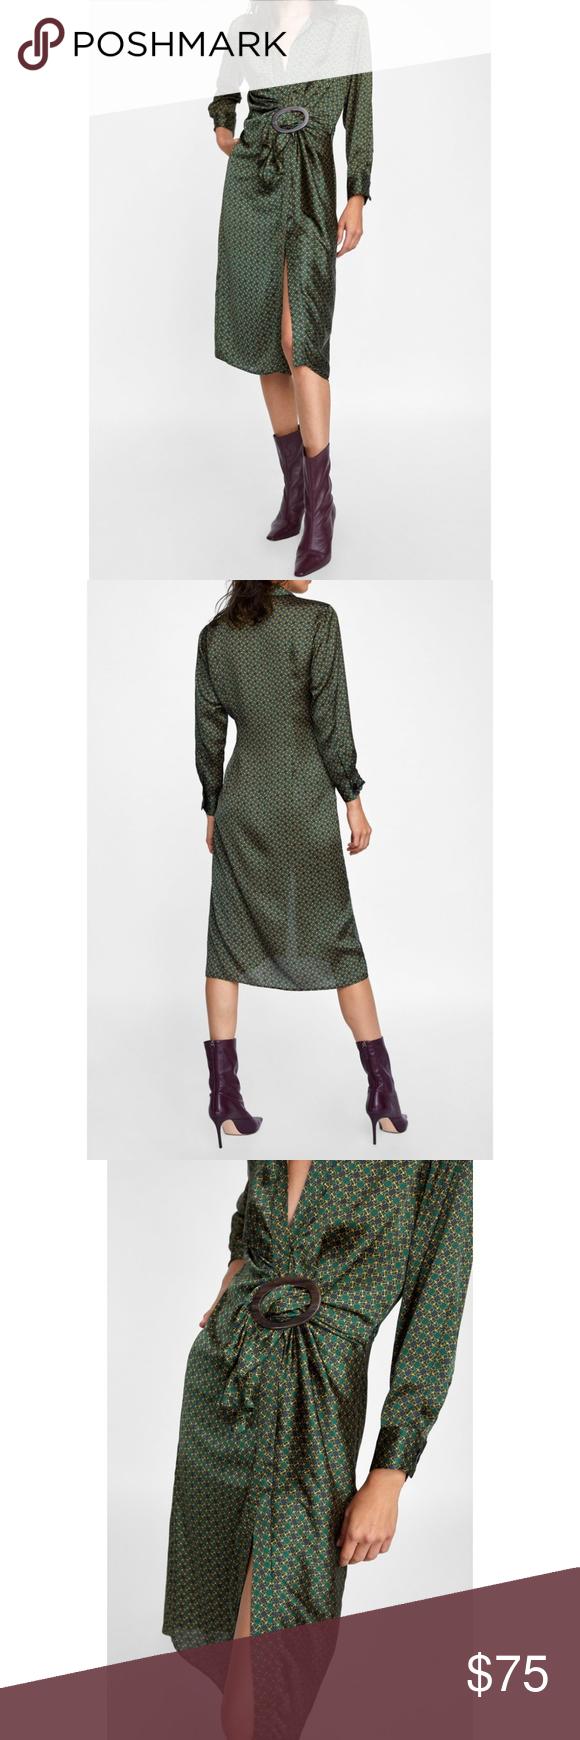 5313f019581 Zara Printed Dress With Buckle V-Neck Slit Midi XS NO OFFERS. PRICE ...